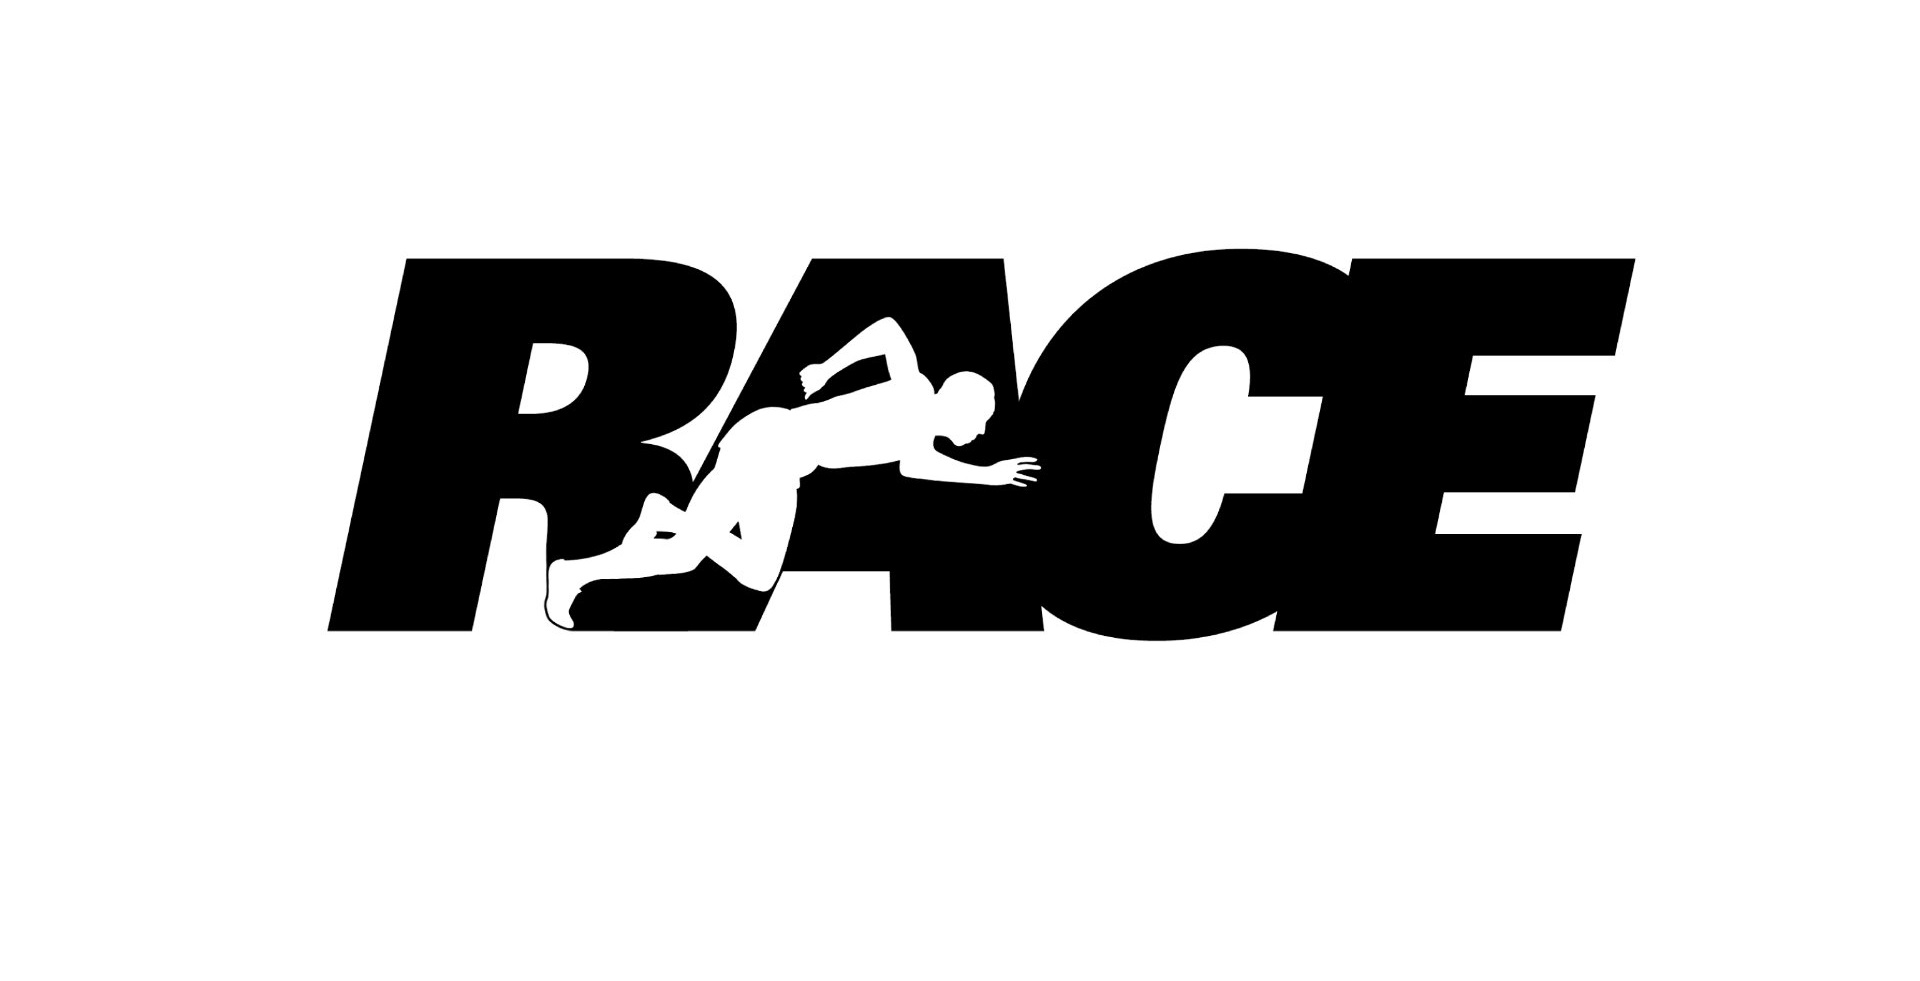 RACECD0